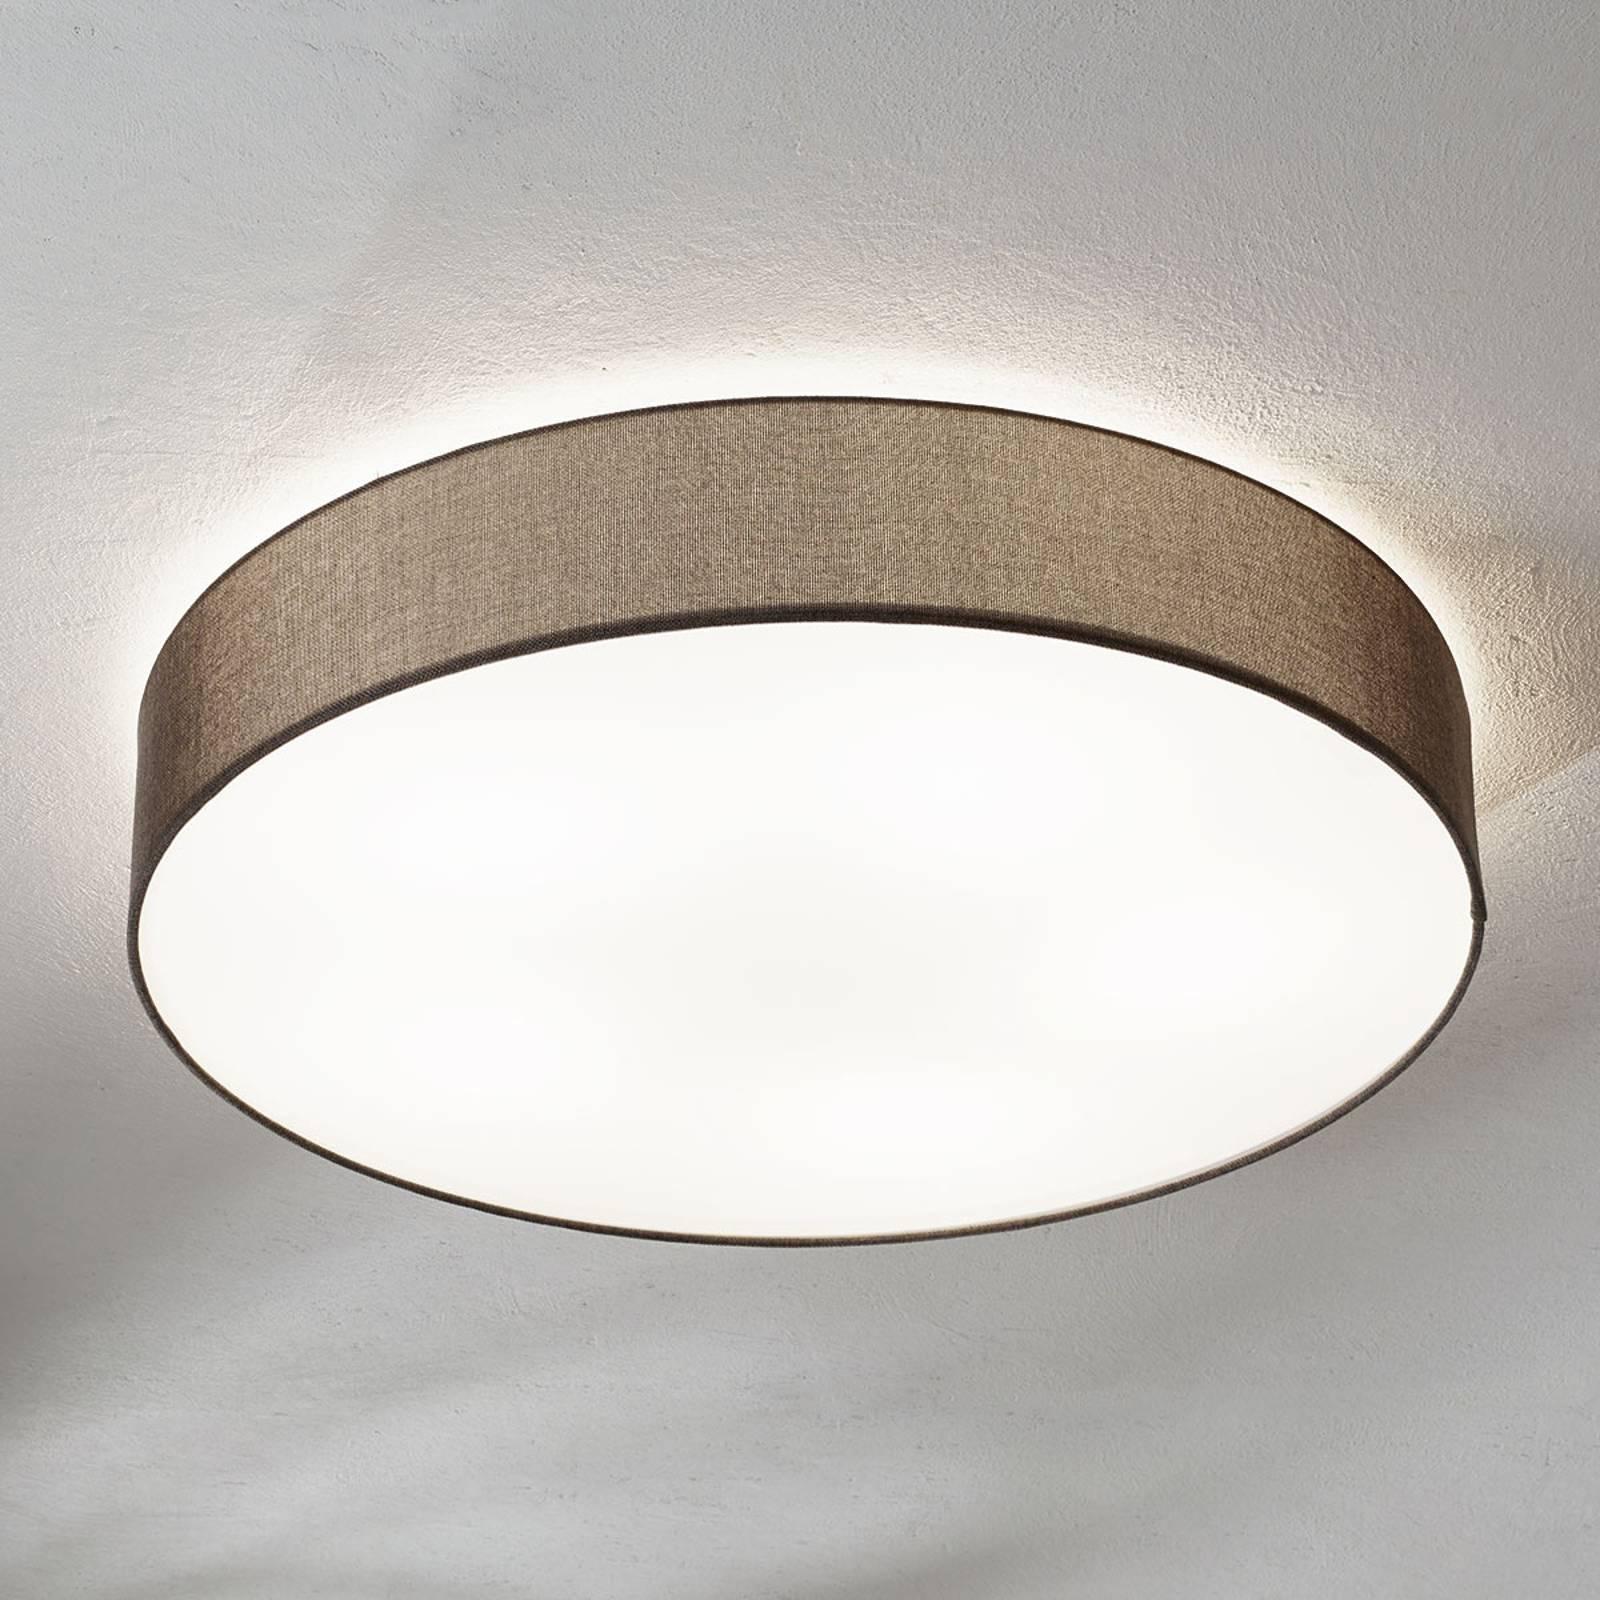 Bruine textiel plafondlamp Pasteri 76 cm